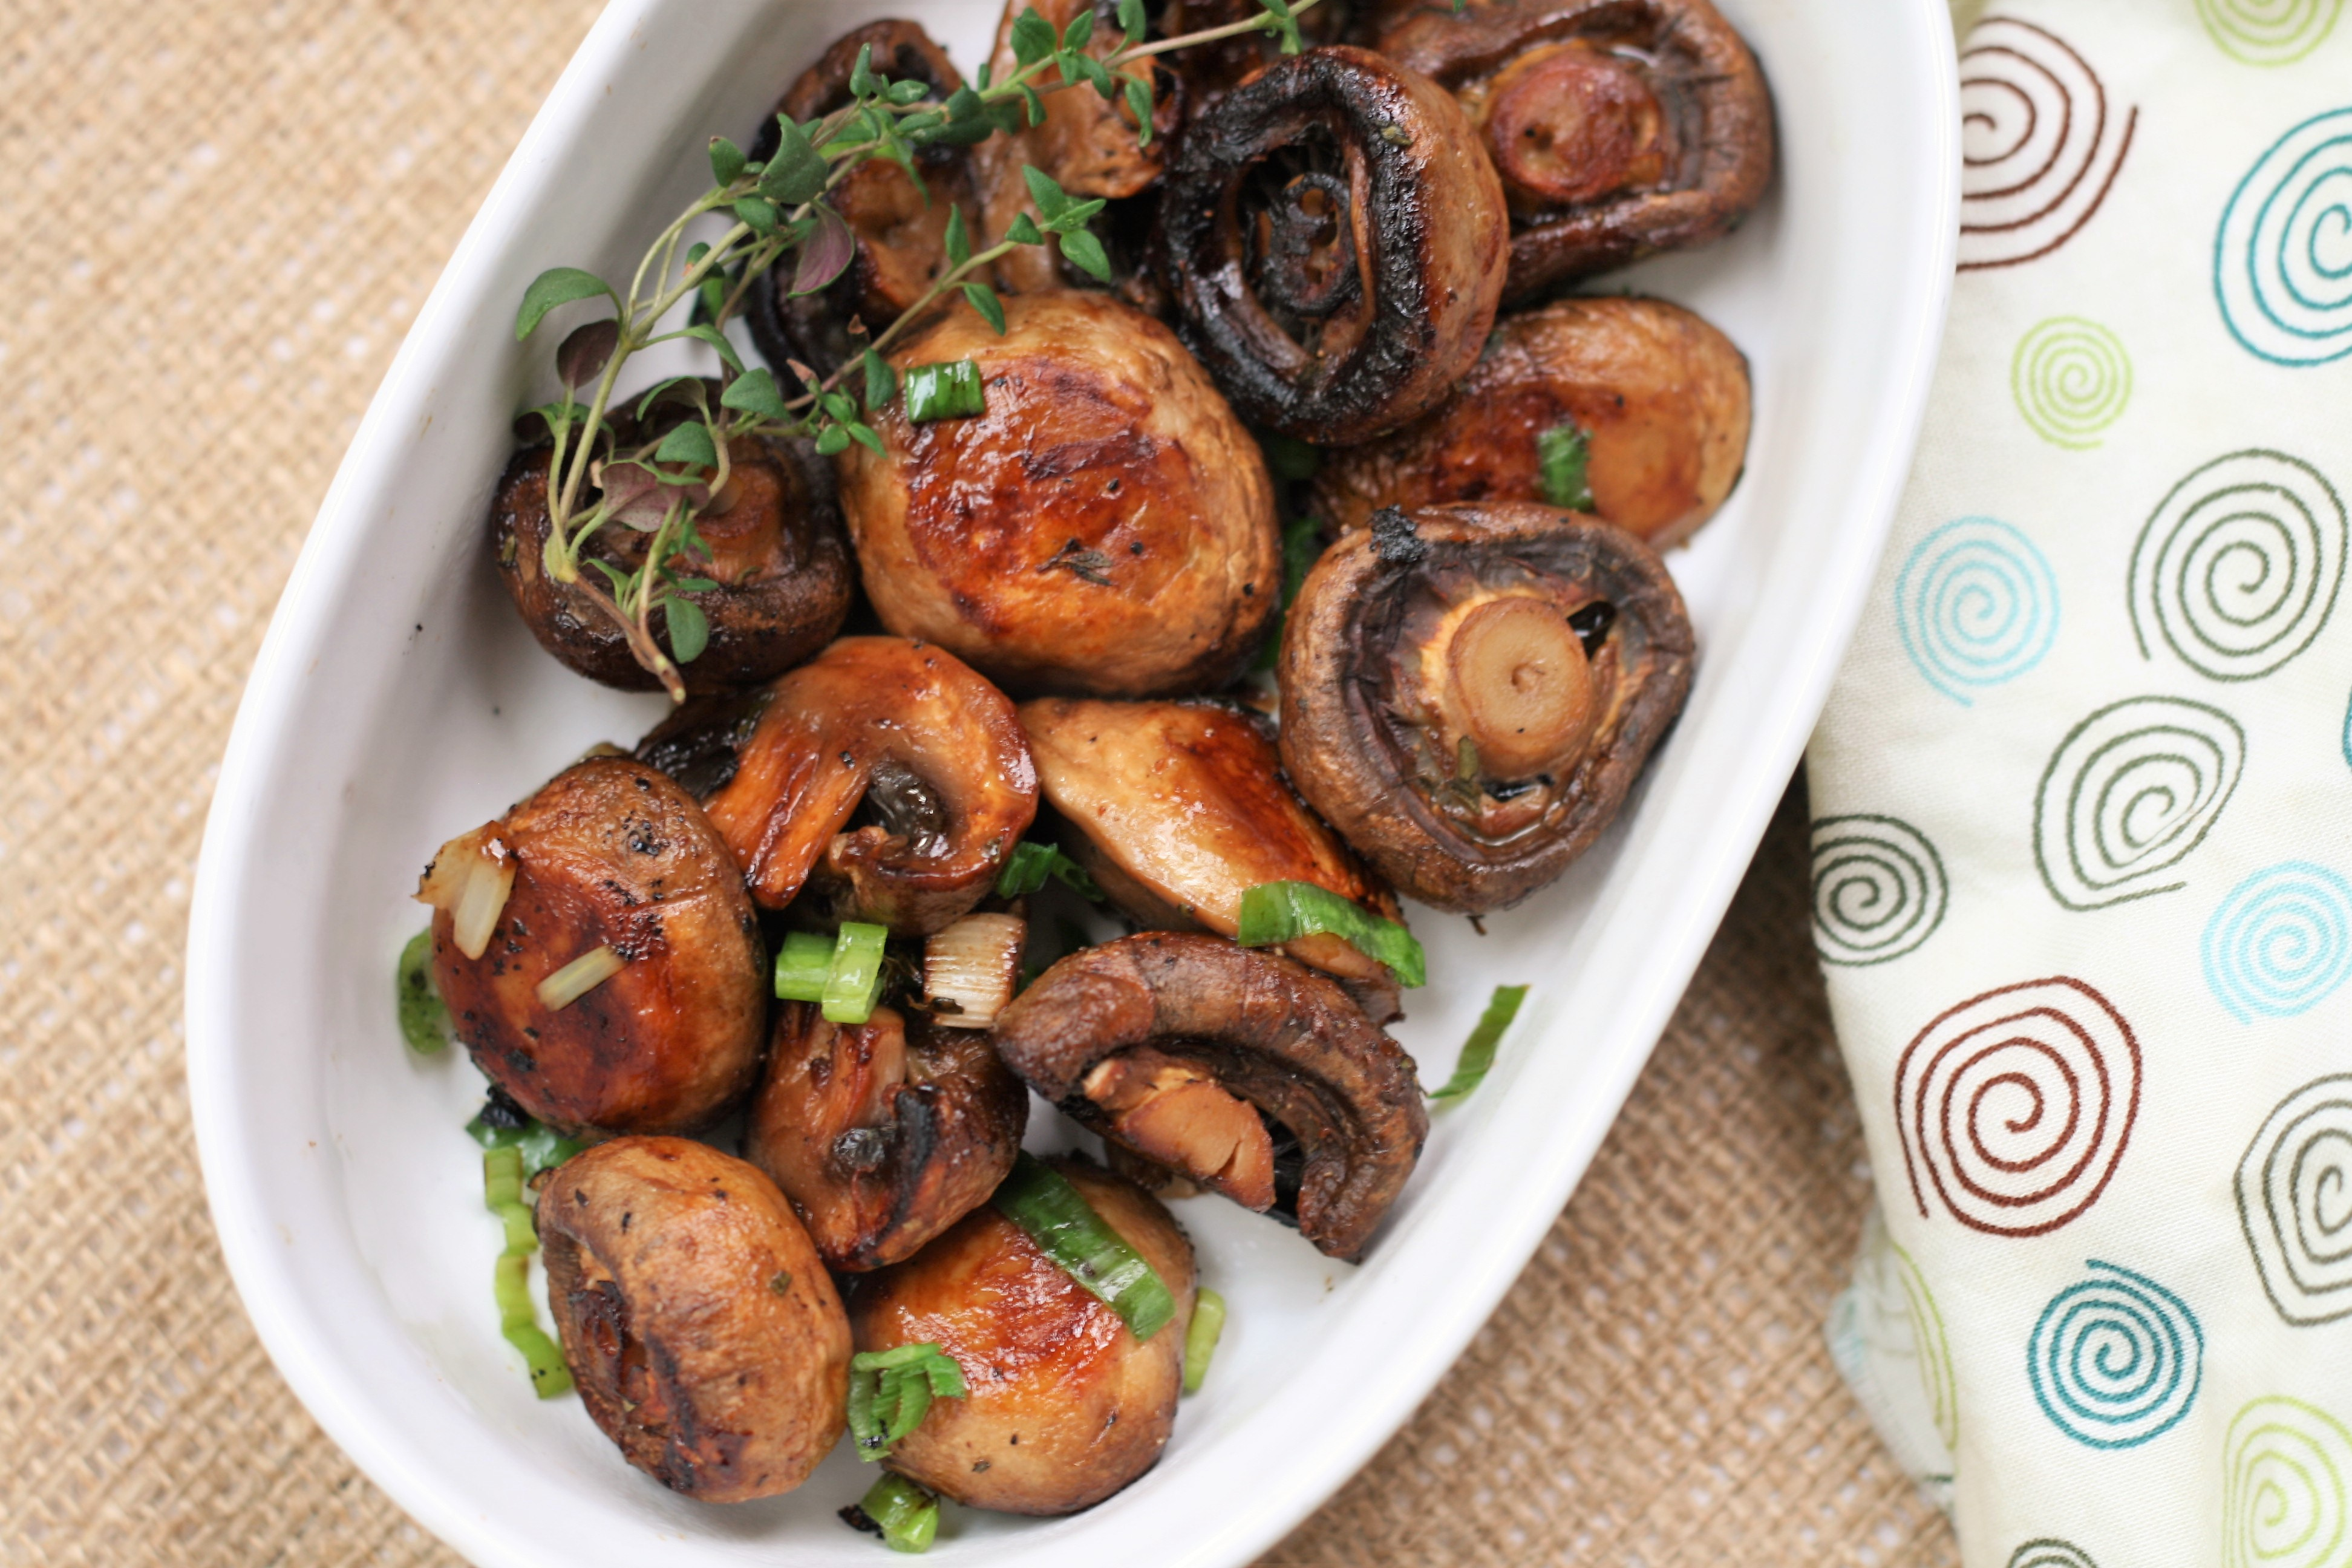 Balsamic-Thyme Roasted Mushrooms